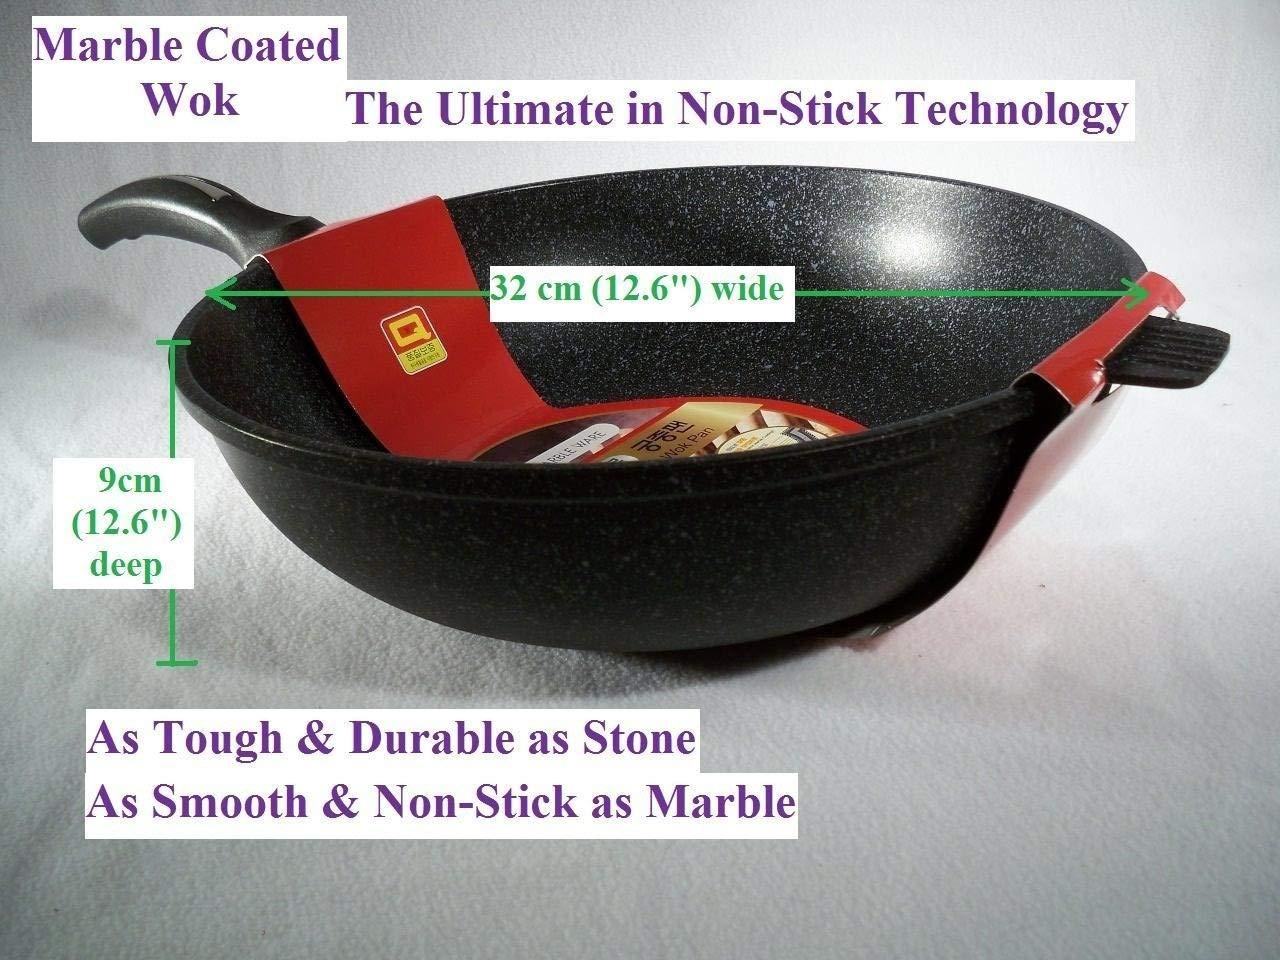 Ceramic Marble Coated Cast Aluminium Non Stick Wok 24 cm KitchenWorld Inc WOK32